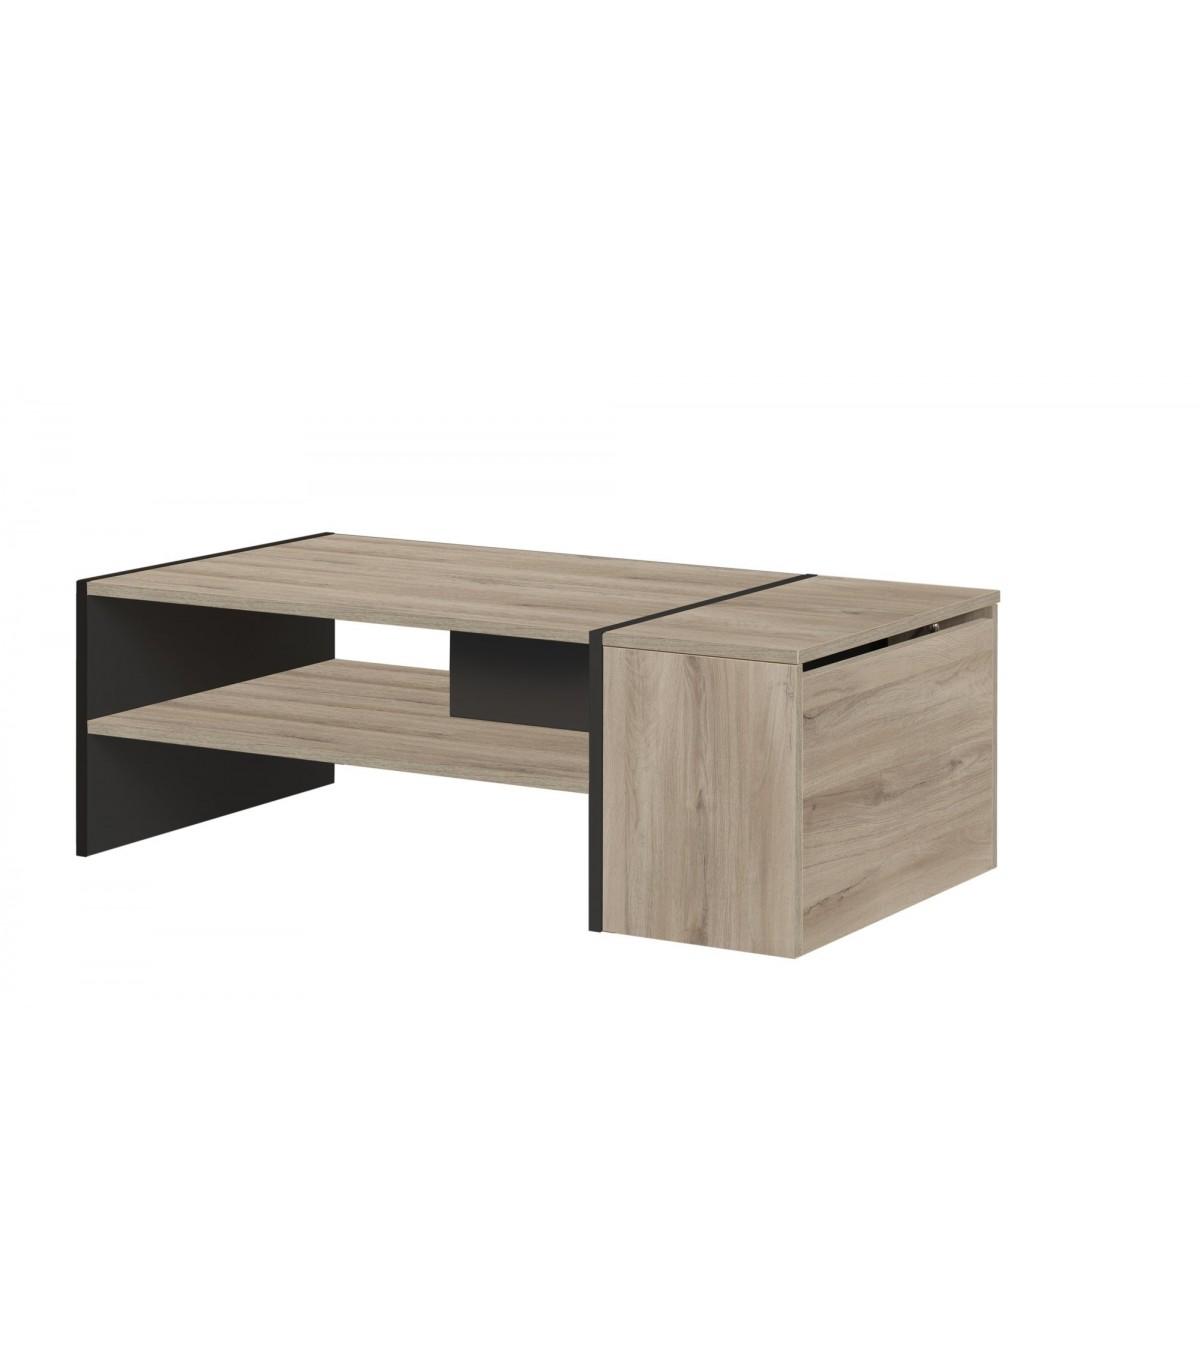 Table Basse Avec Rangement Bar Yori Fabrication Francaise